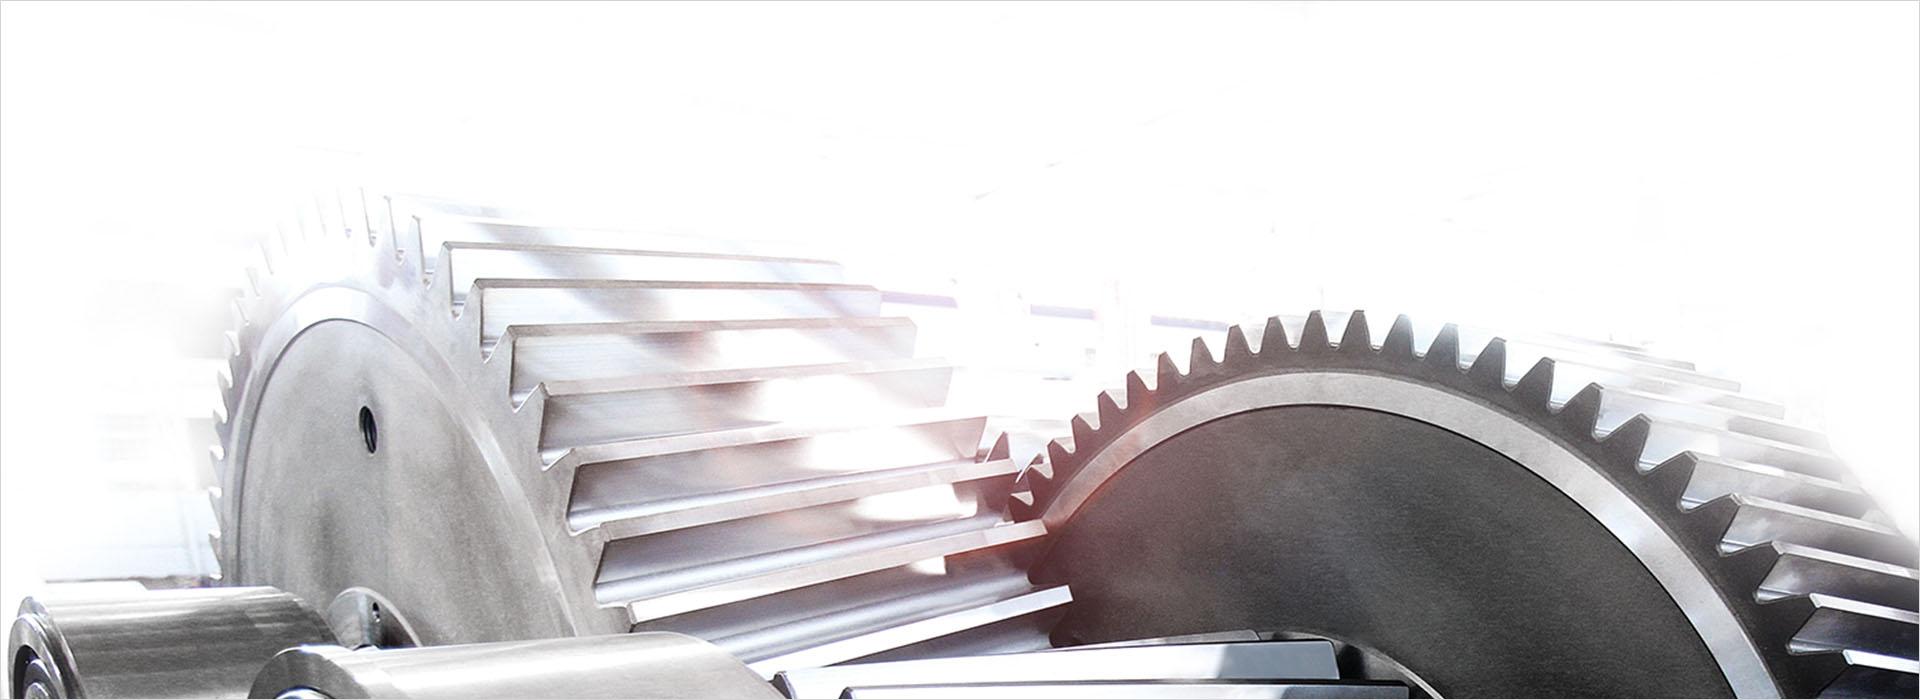 Industrie Getriebe